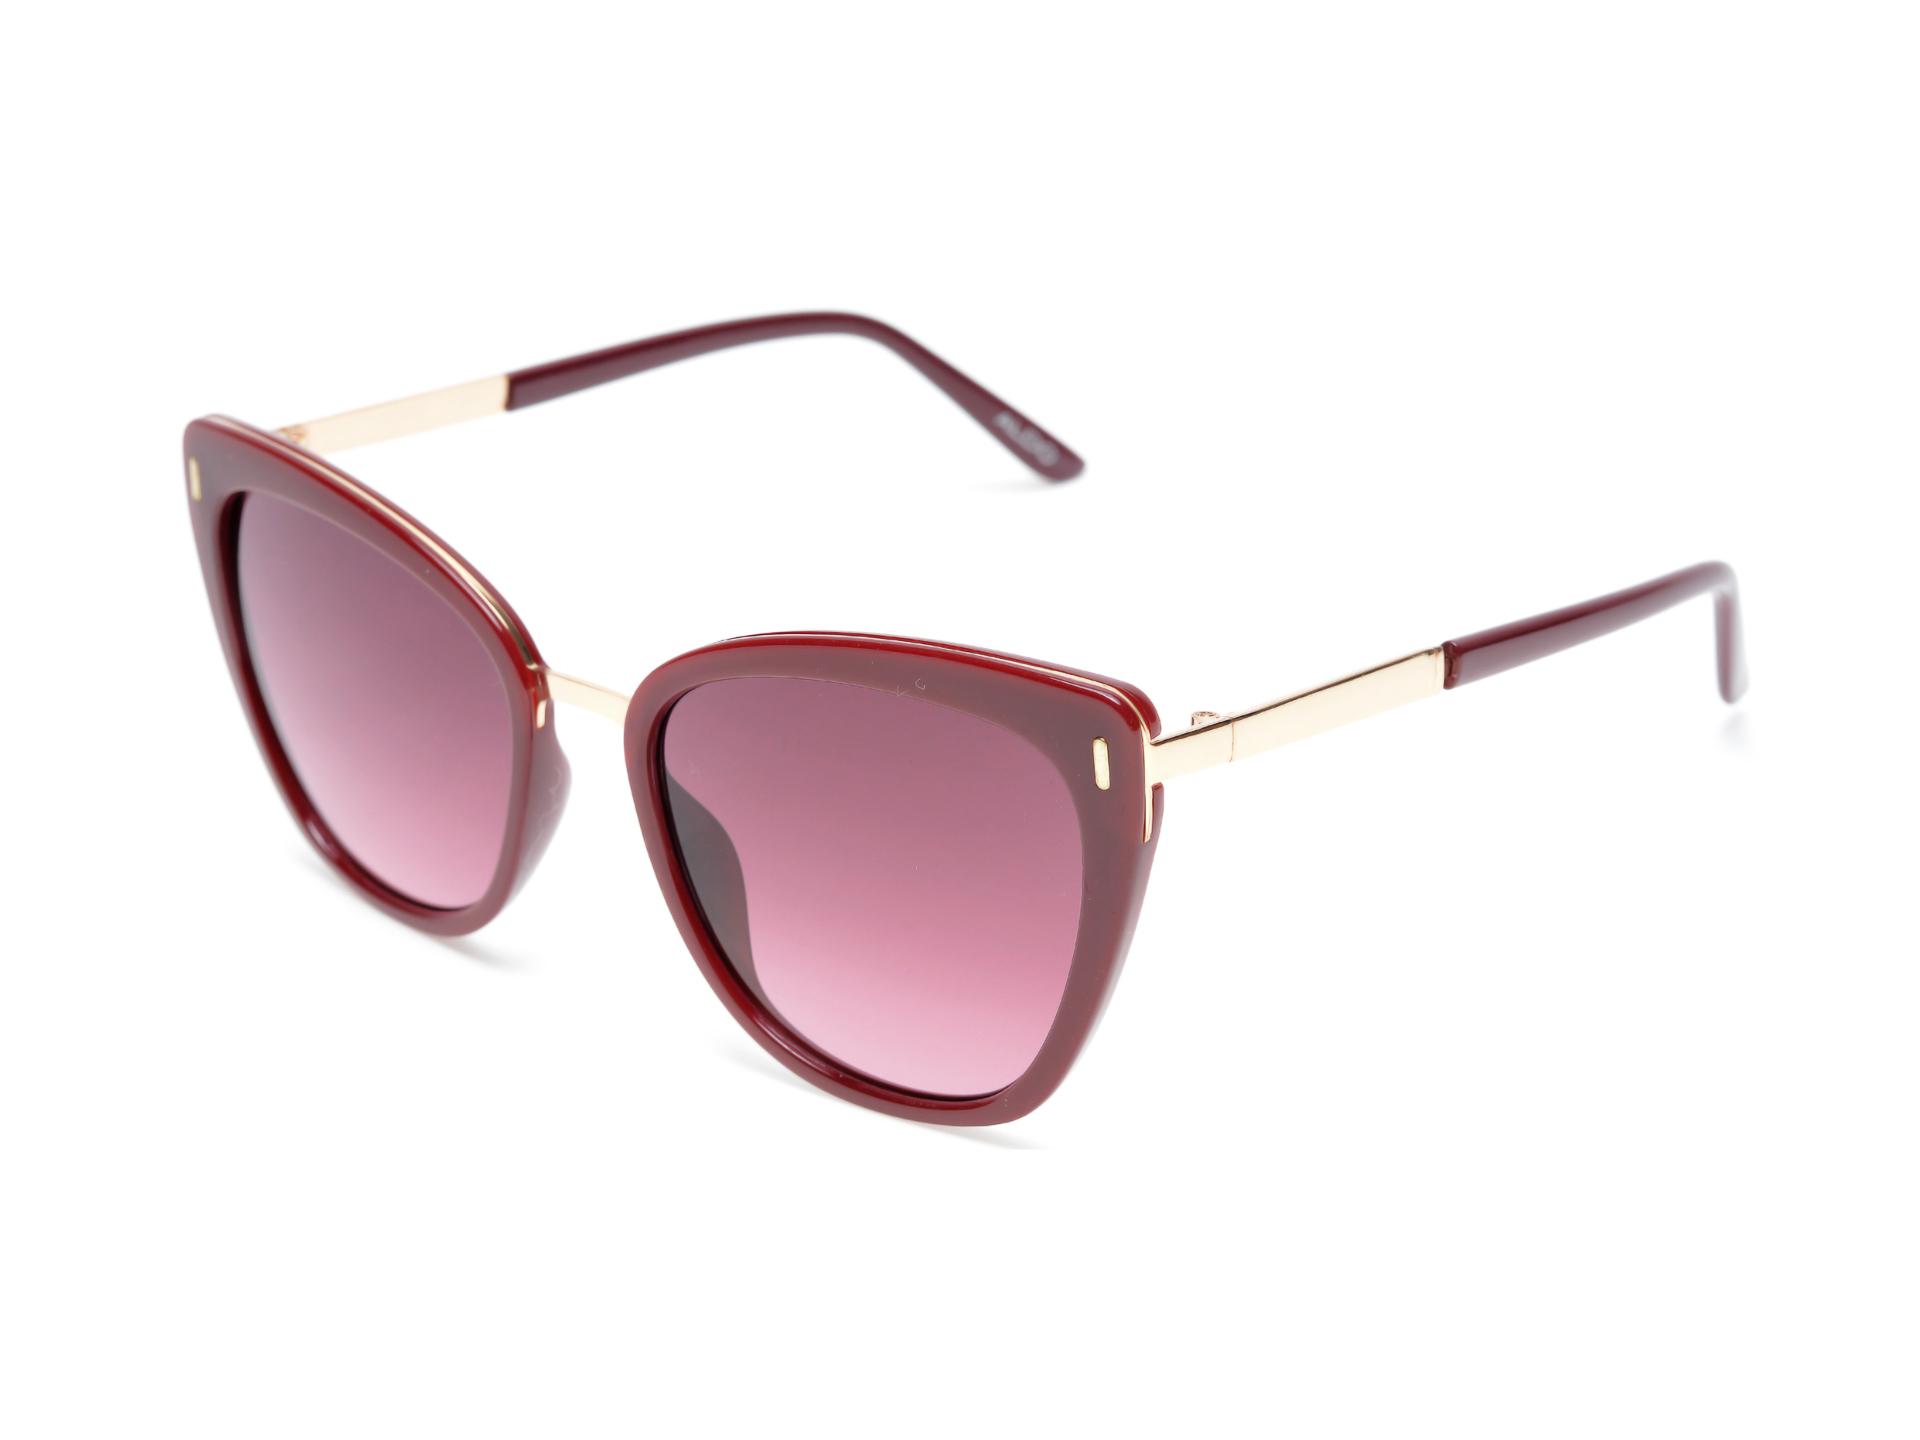 Ochelari de soare ALDO visinii, Lawsonia601, din pvc imagine